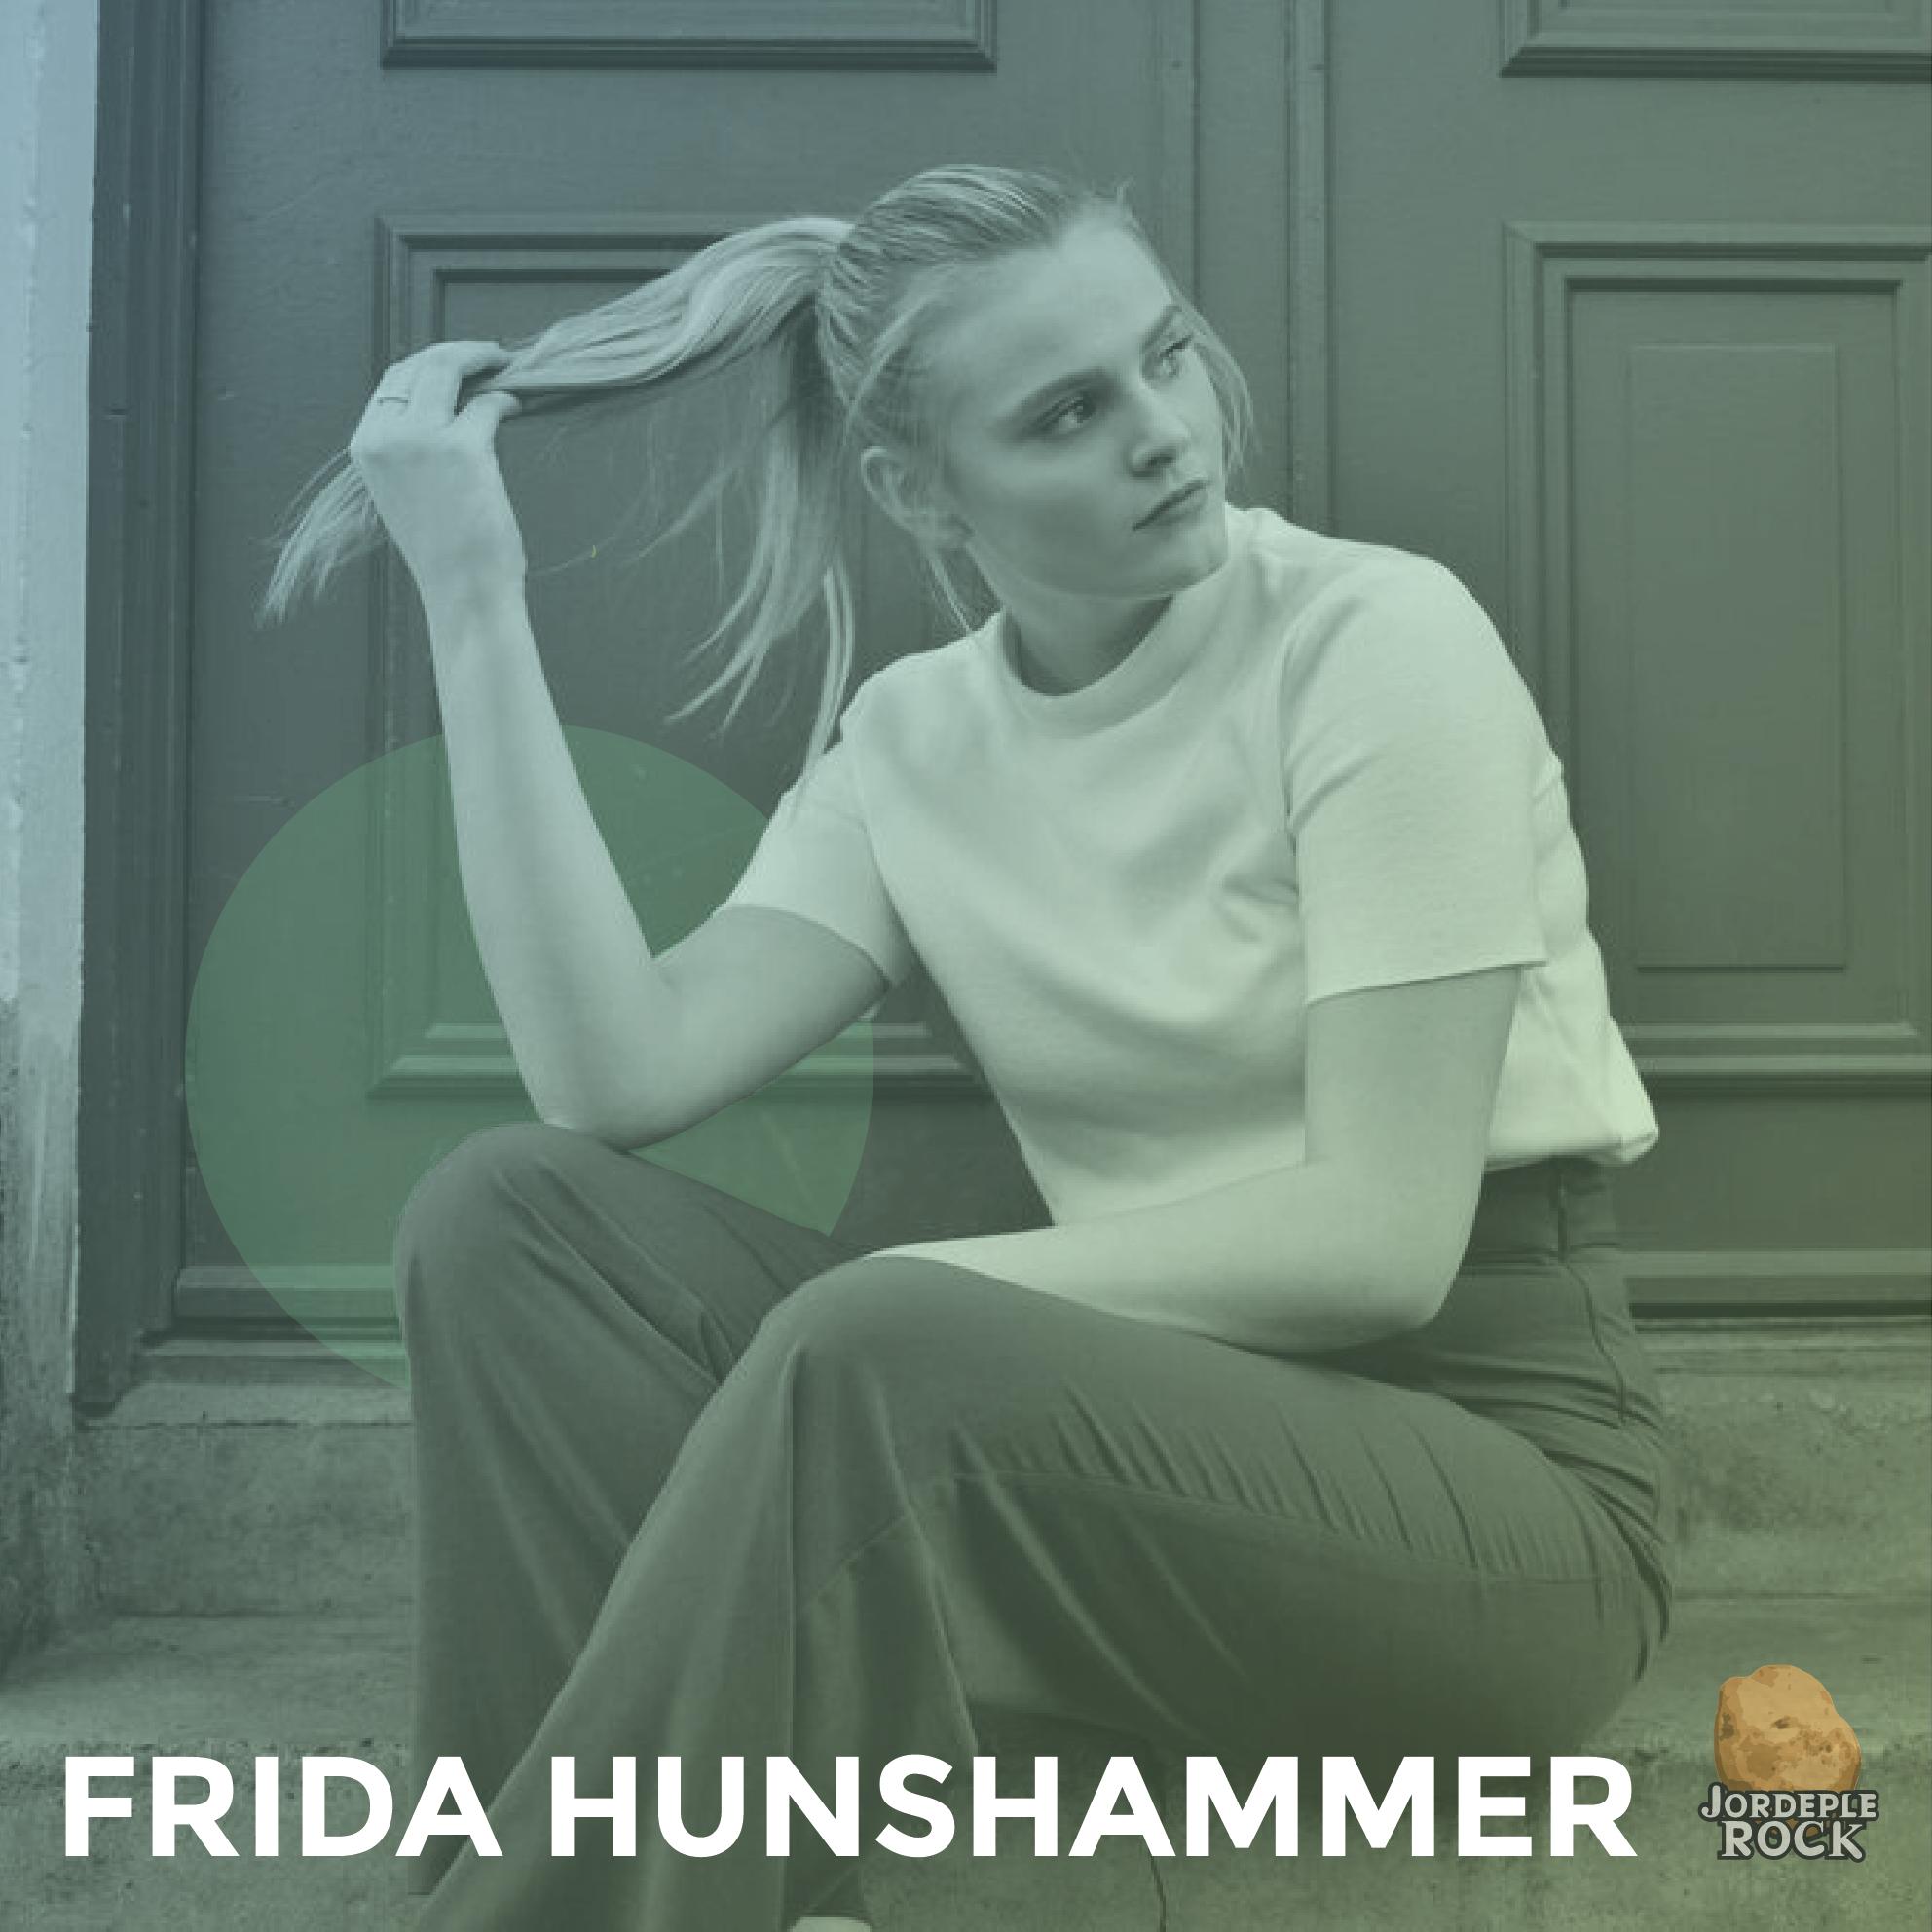 Frida Hunshammer profil.png